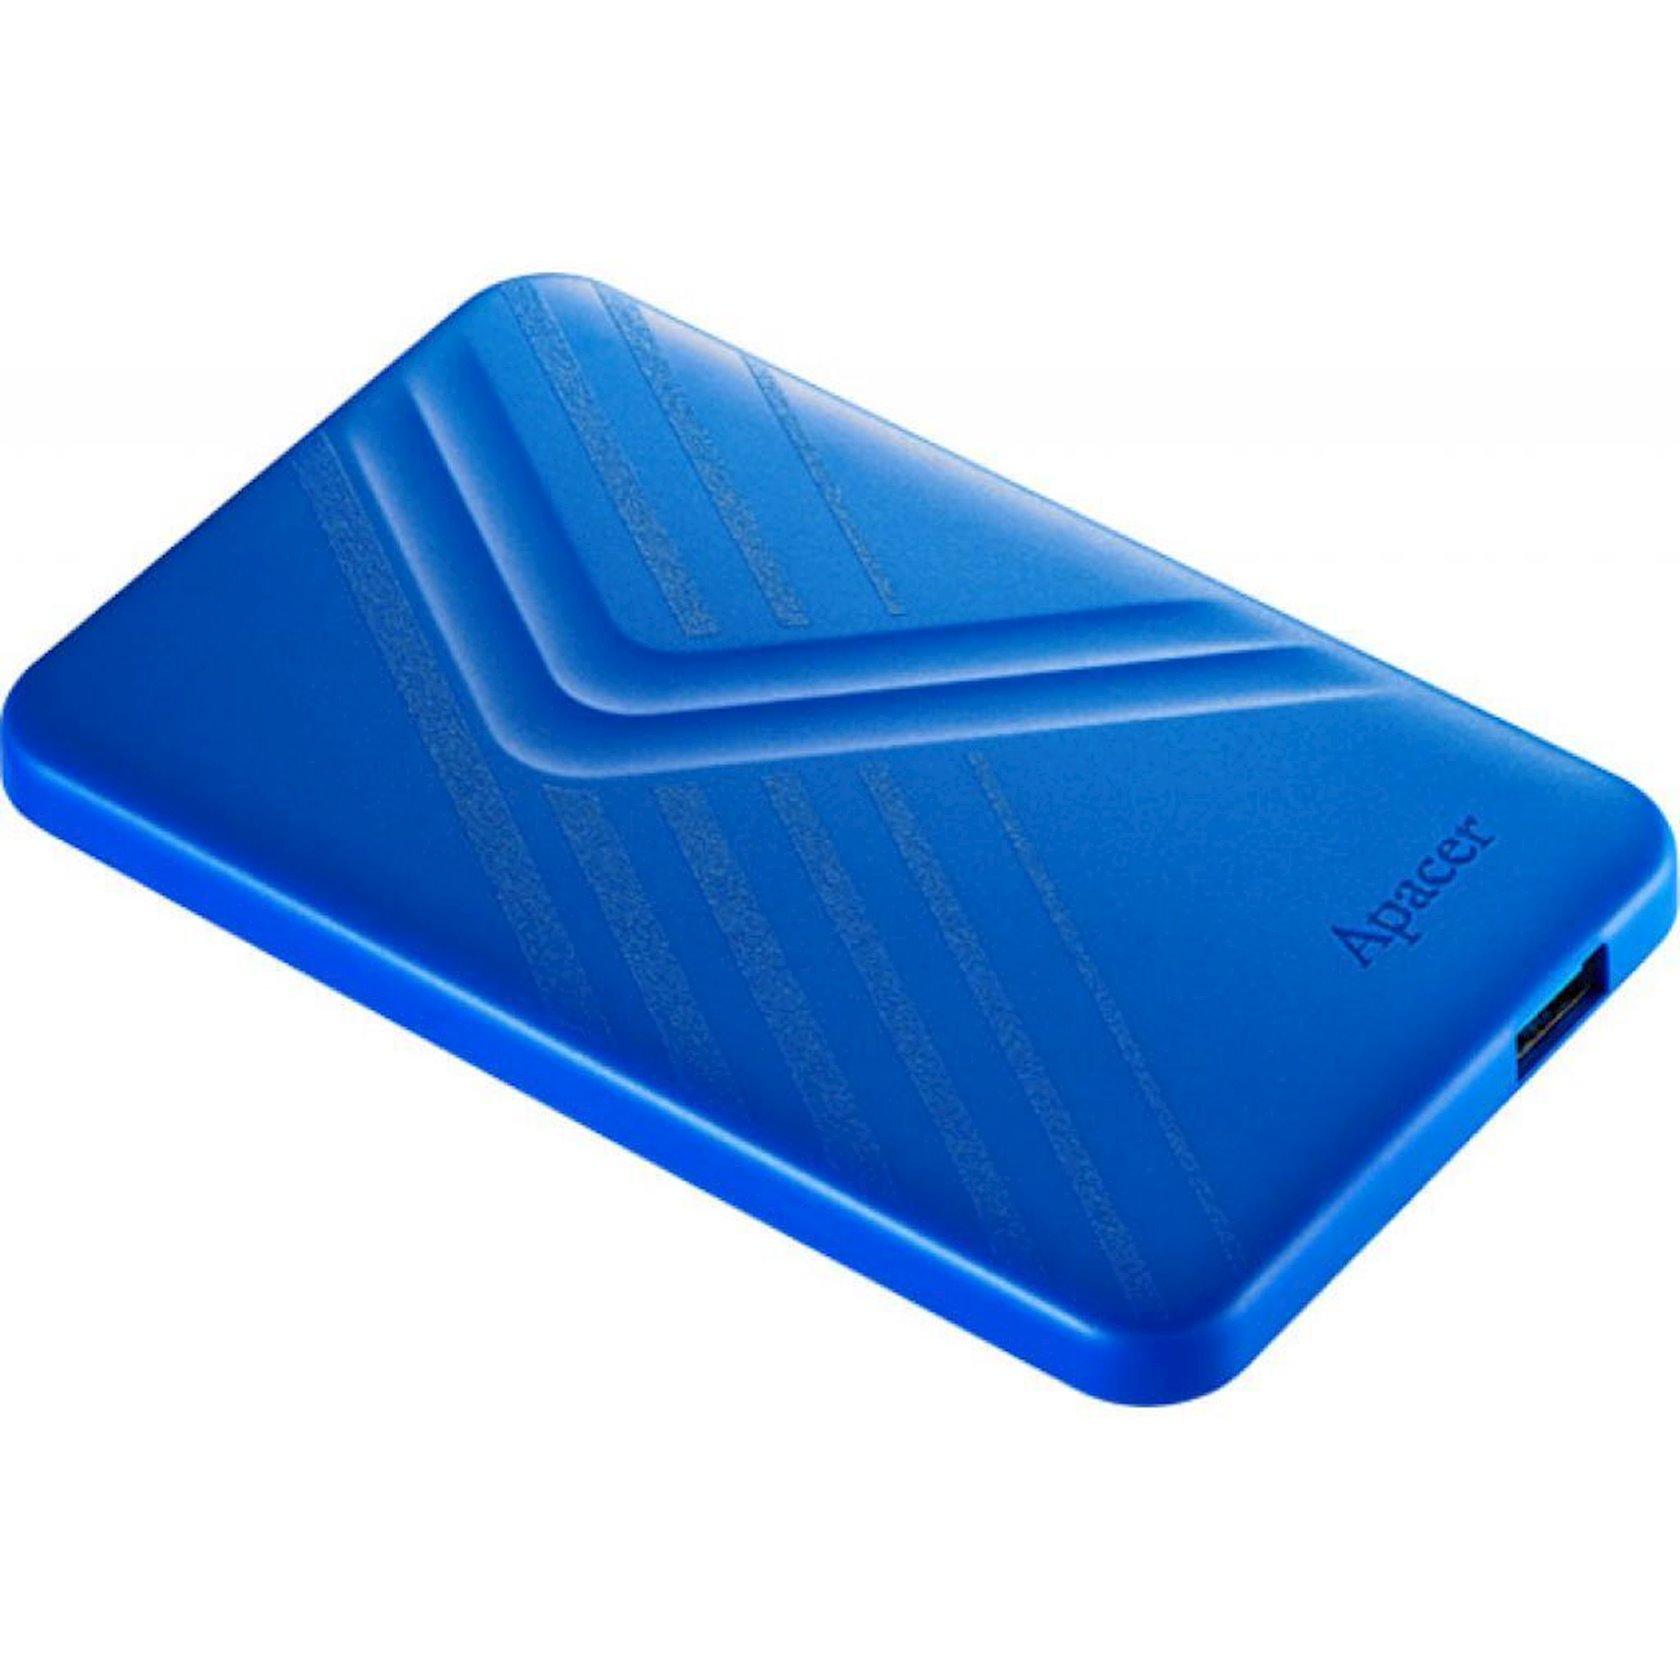 Xarici sərt disk Apacer 2 TB USB 3.1 Portable Hard Drive AC236 Blue